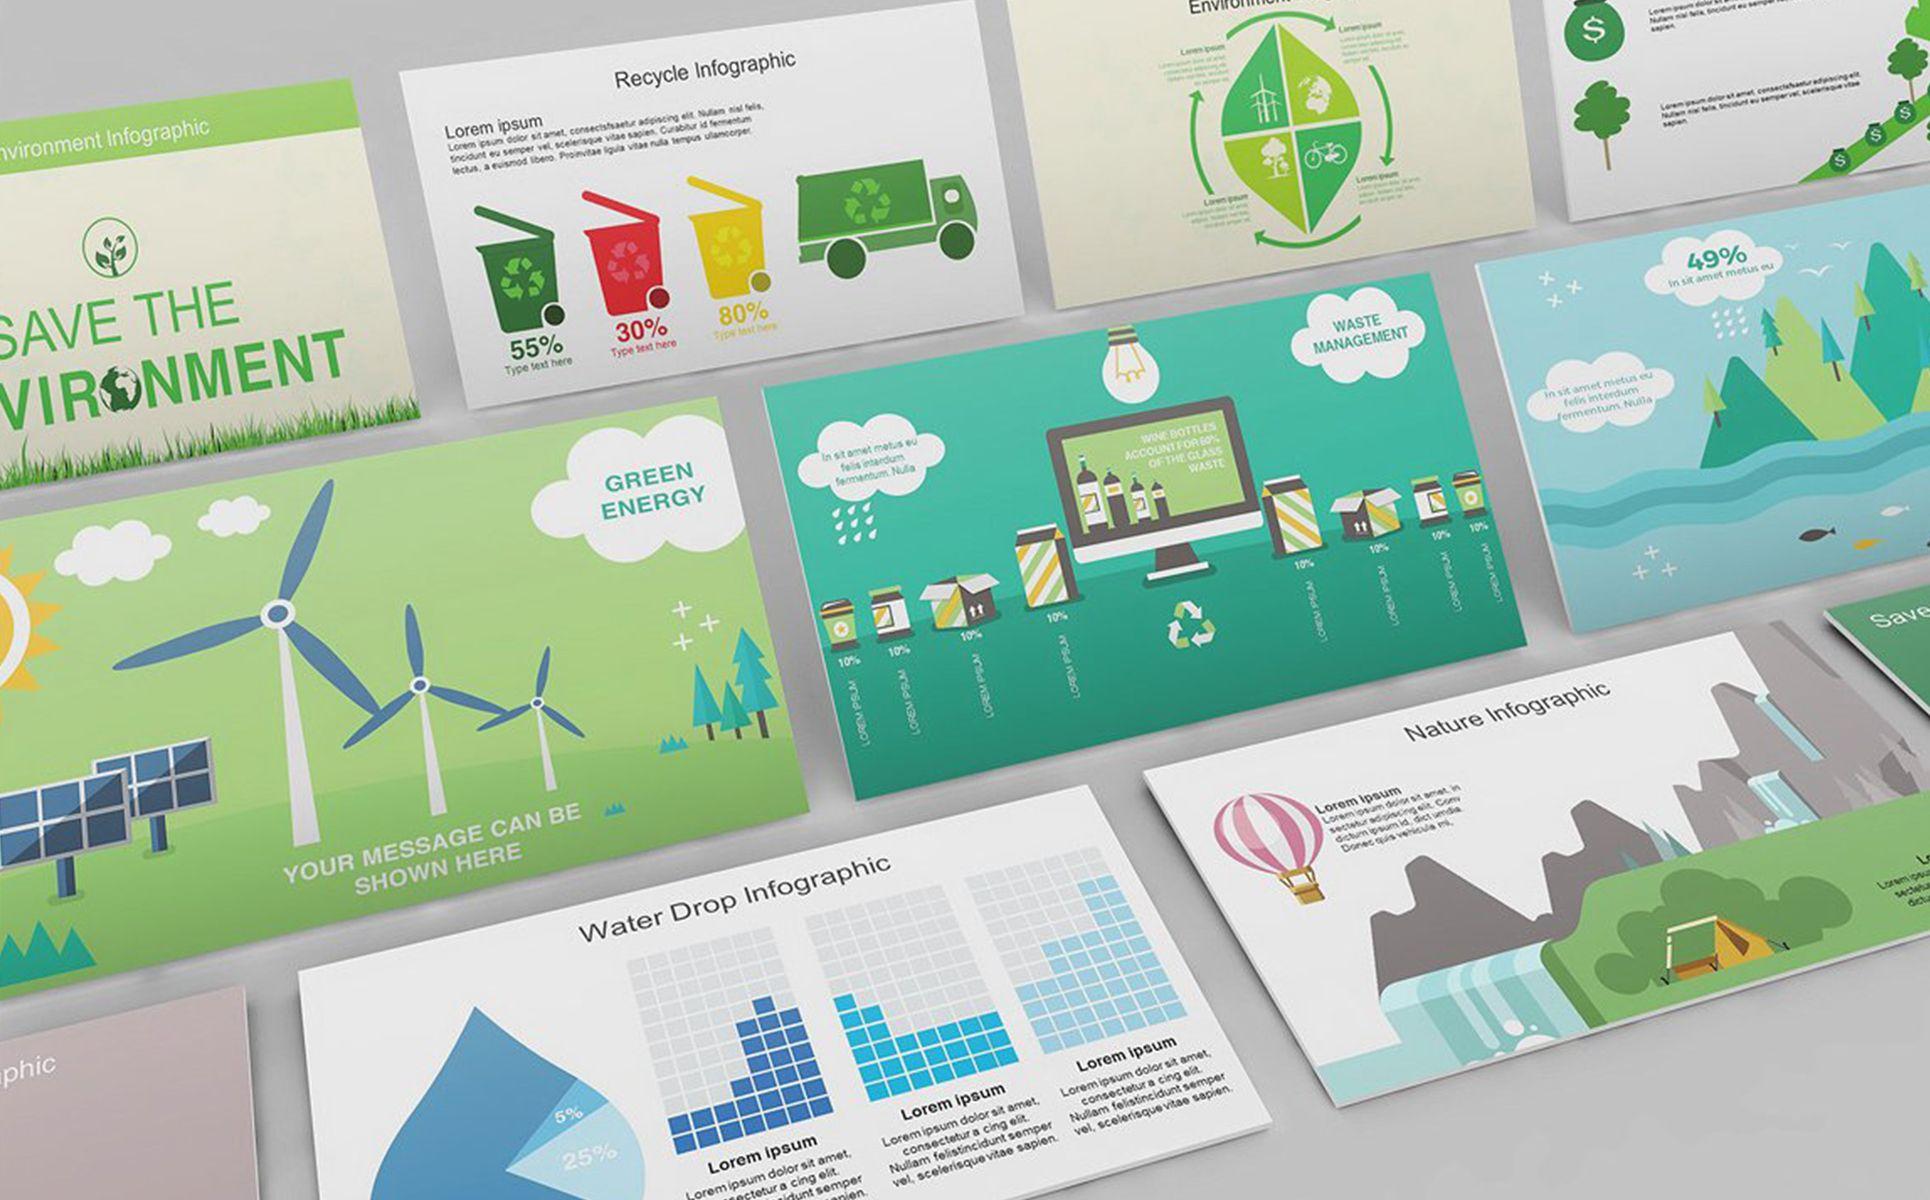 Environment Infographic Keynote Template Retail Logo Behance